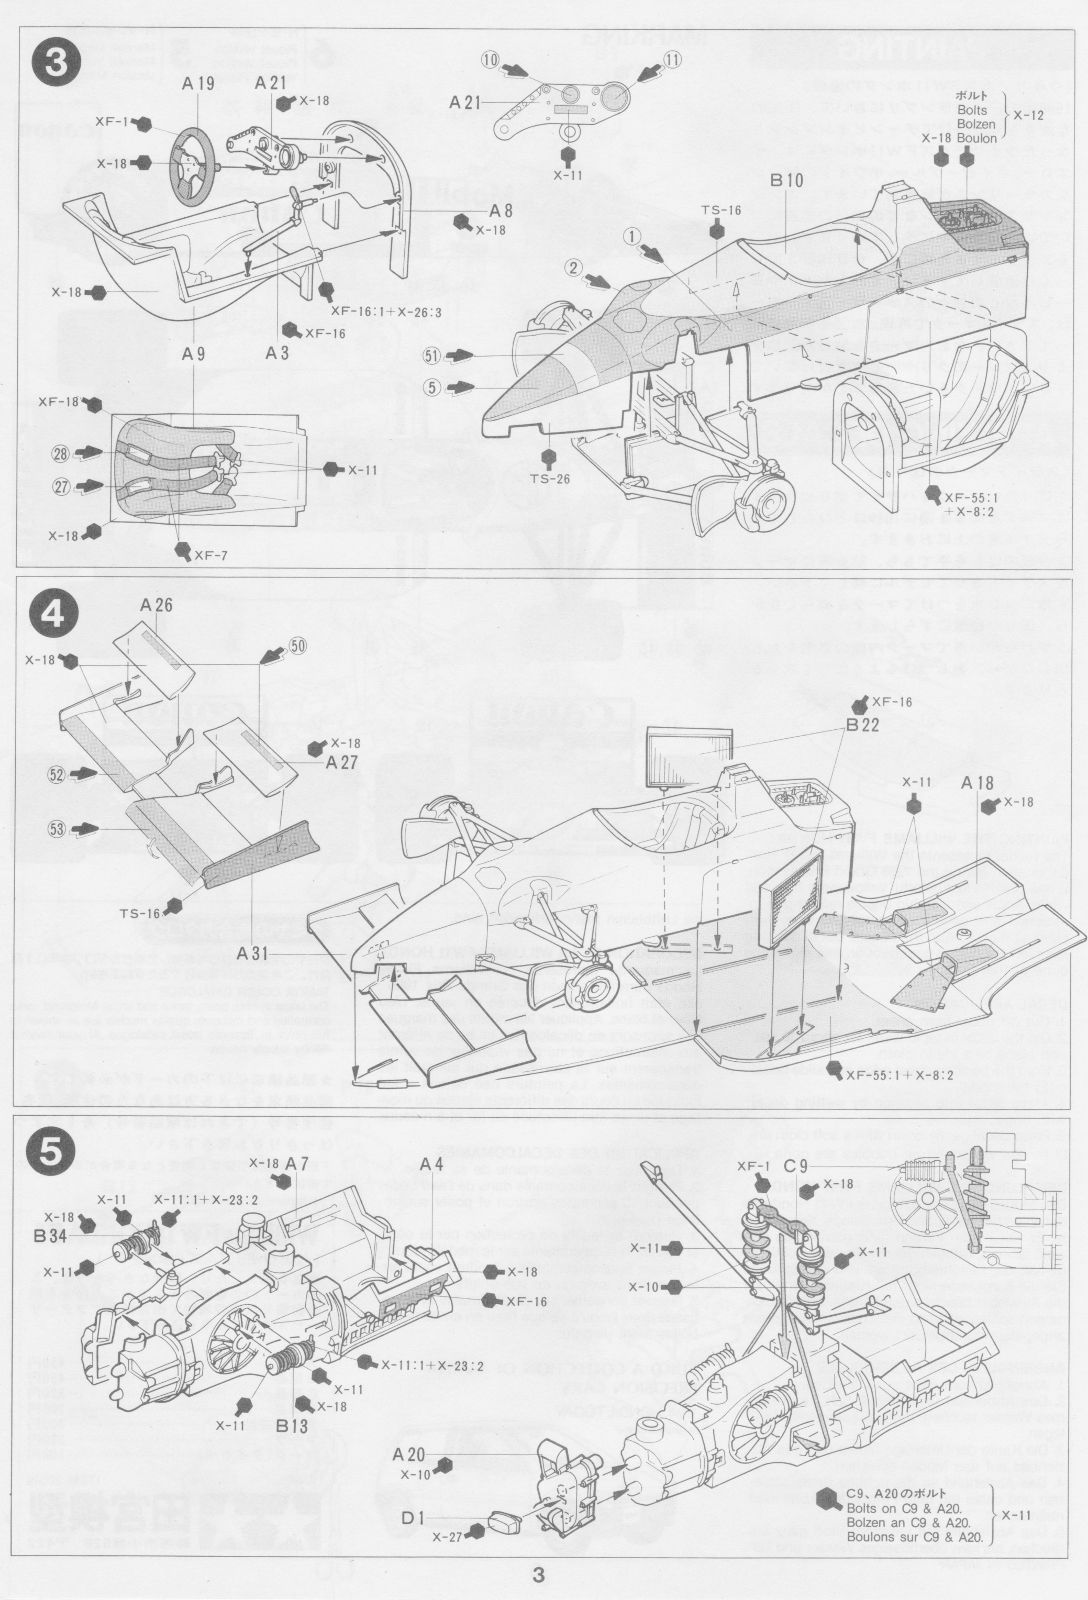 Tamiya 1/20 Williams FW11 image by Gluefinger Drawing